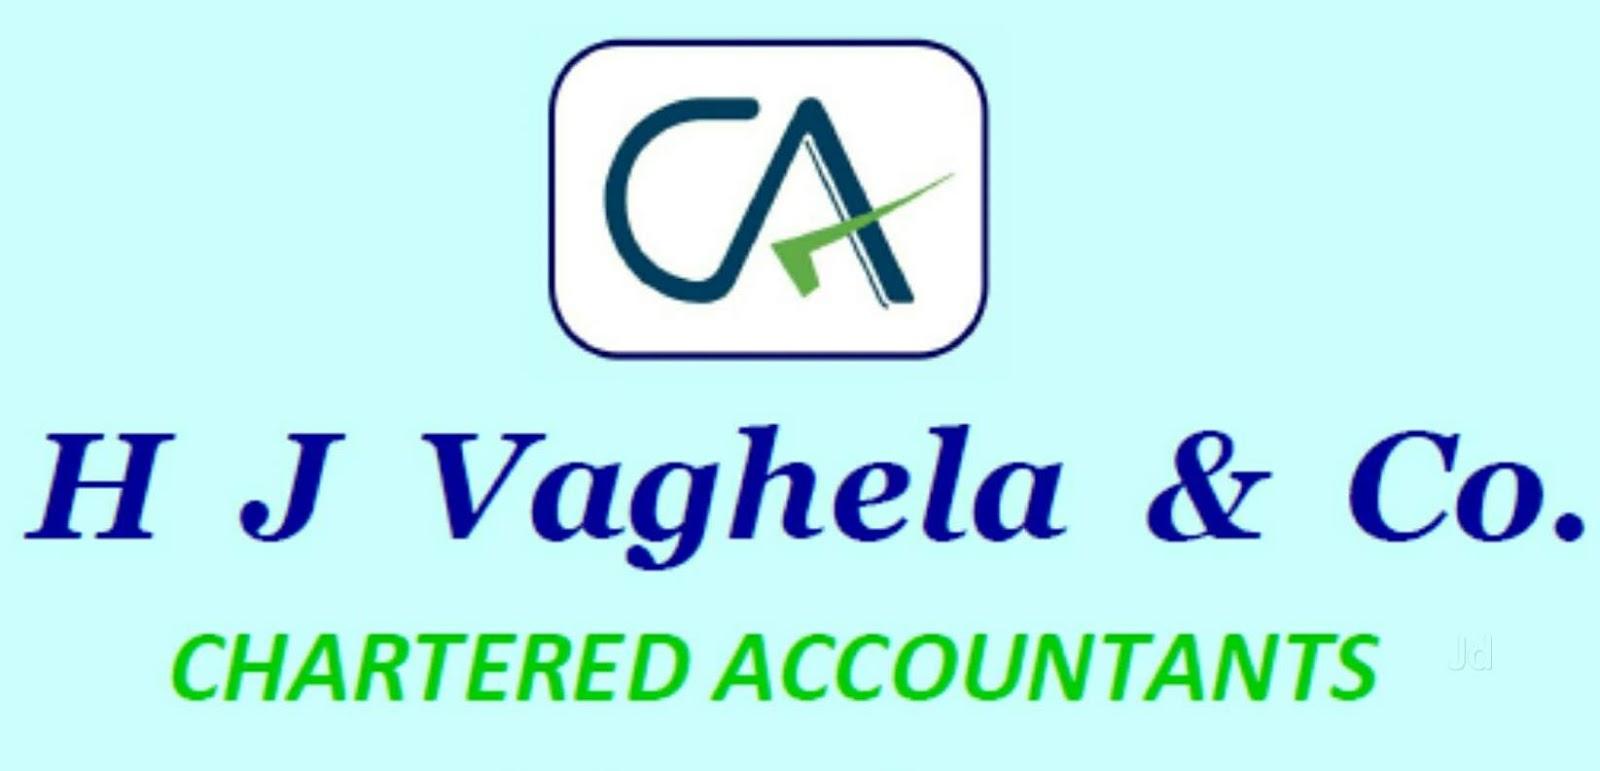 Ca A Symbol Of Trust By Ca Harshad Vaghela